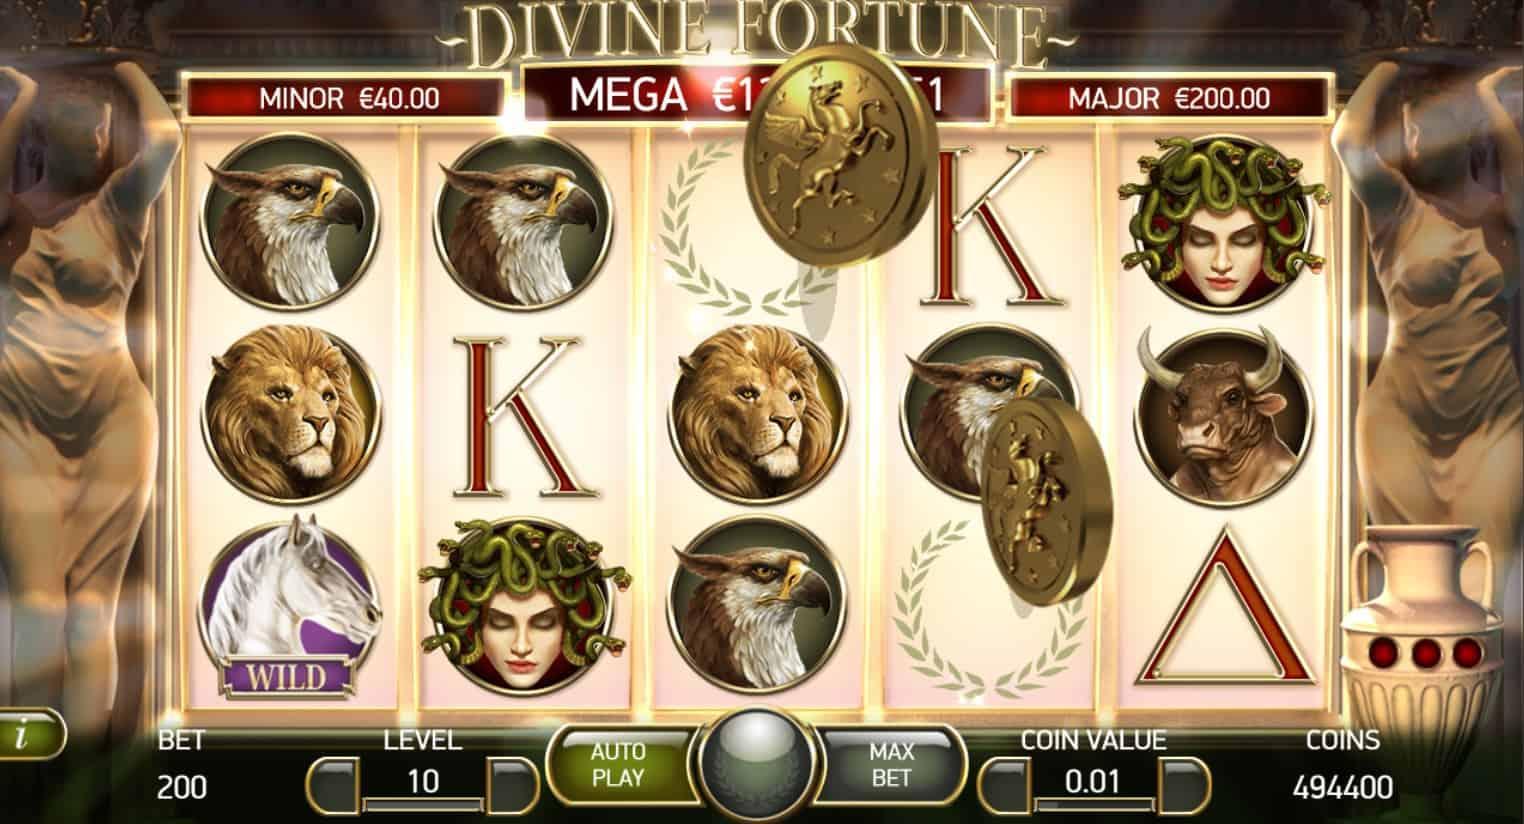 netent - divine fortune - jackpot - casinogroundsdotcom